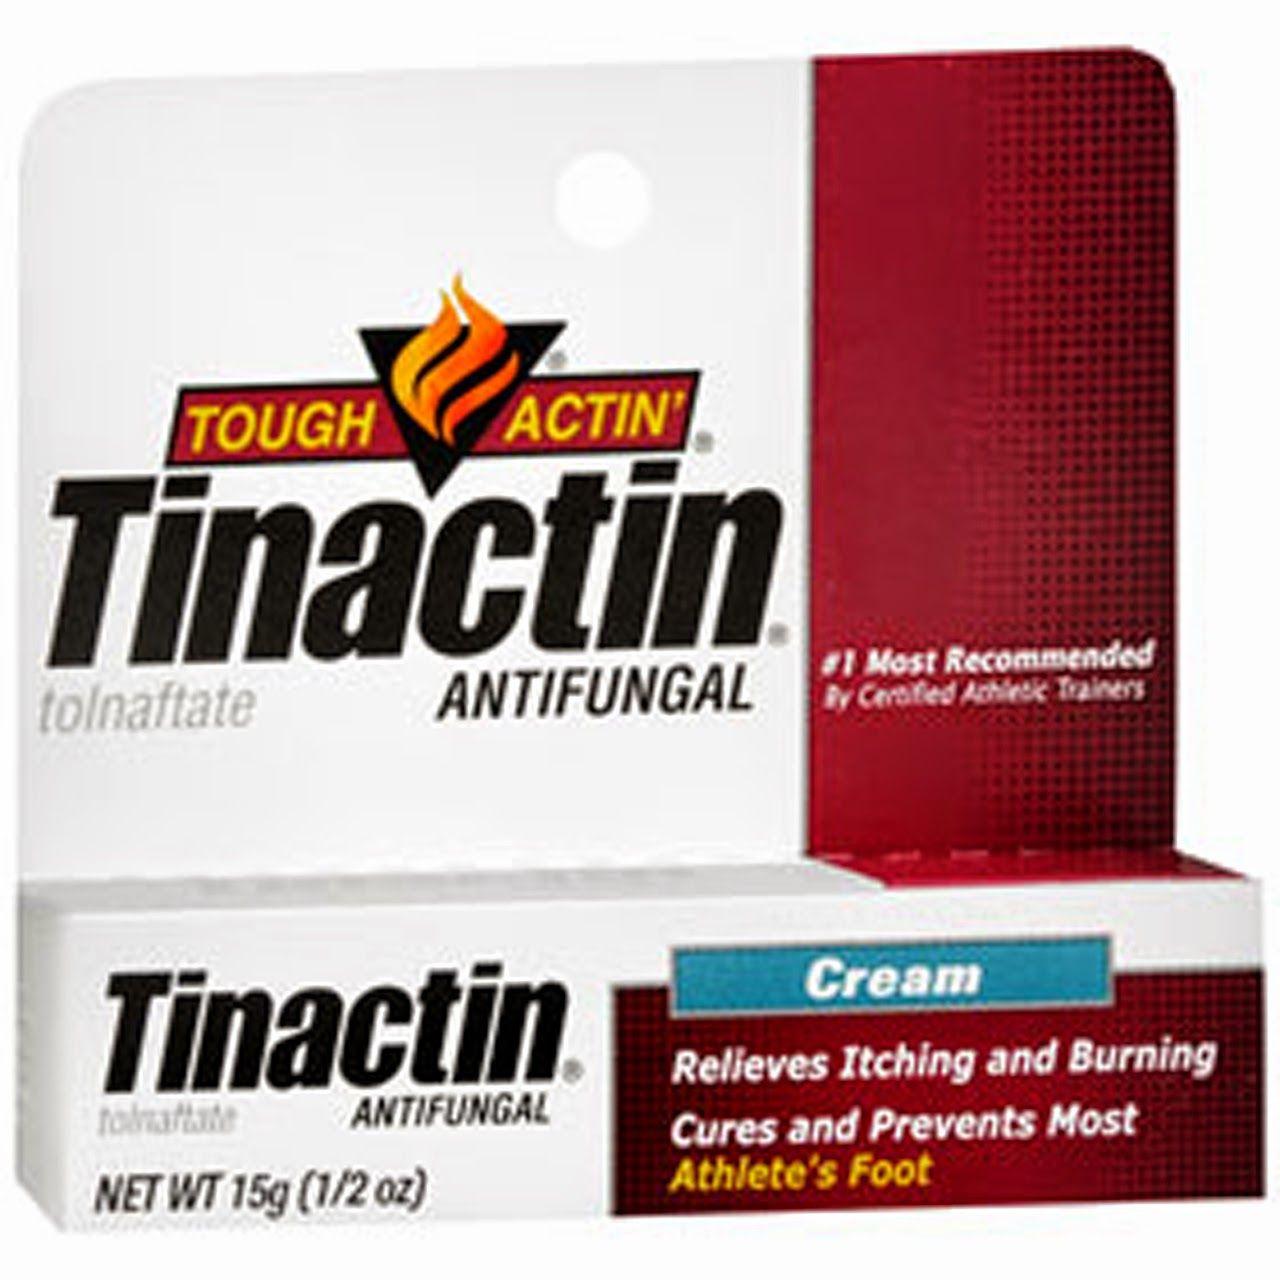 CORKSCREW TAIL Tail Pocket problems? Yeast / ? chronic